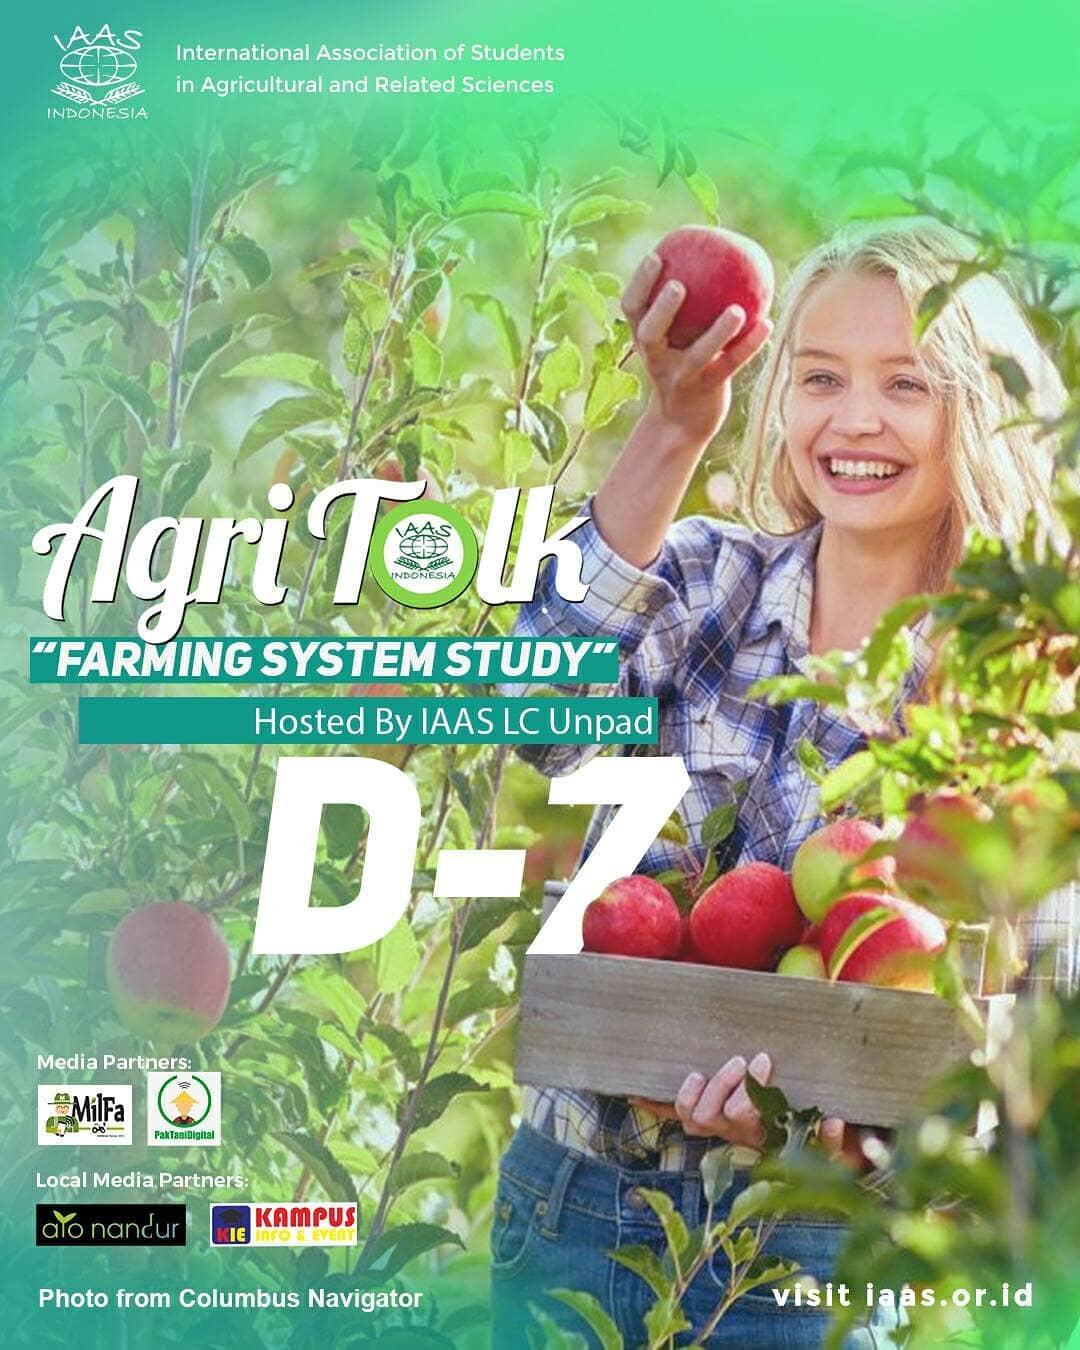 AGRITALK - Farming System Study